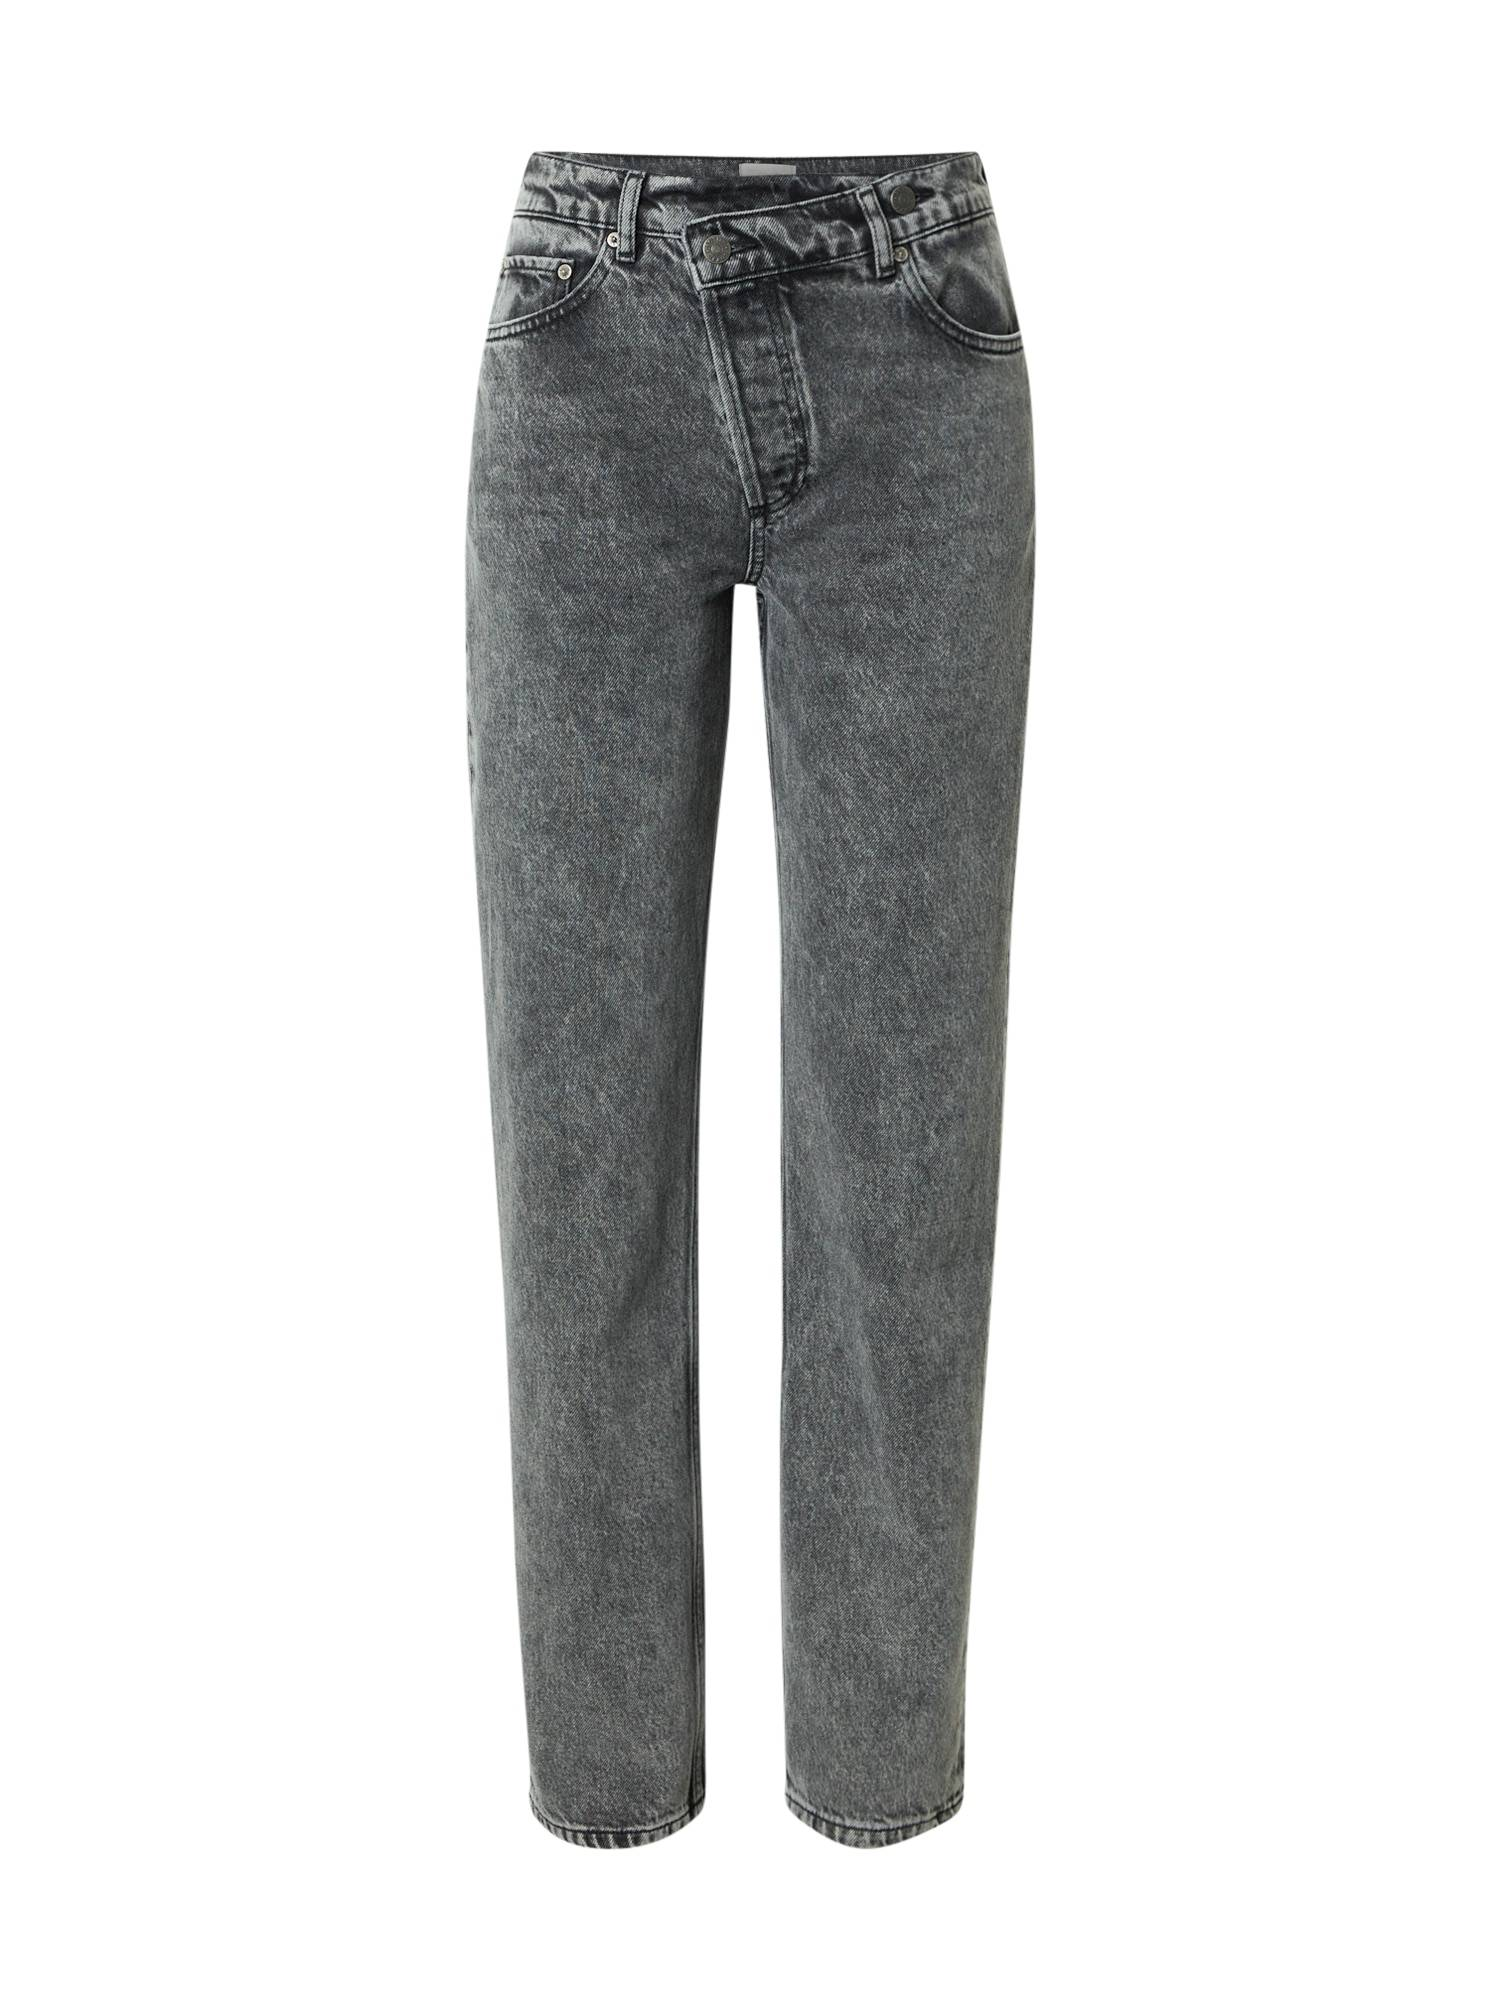 Boyish Jean 'CASEY'  - Gris - Taille: 28 - female